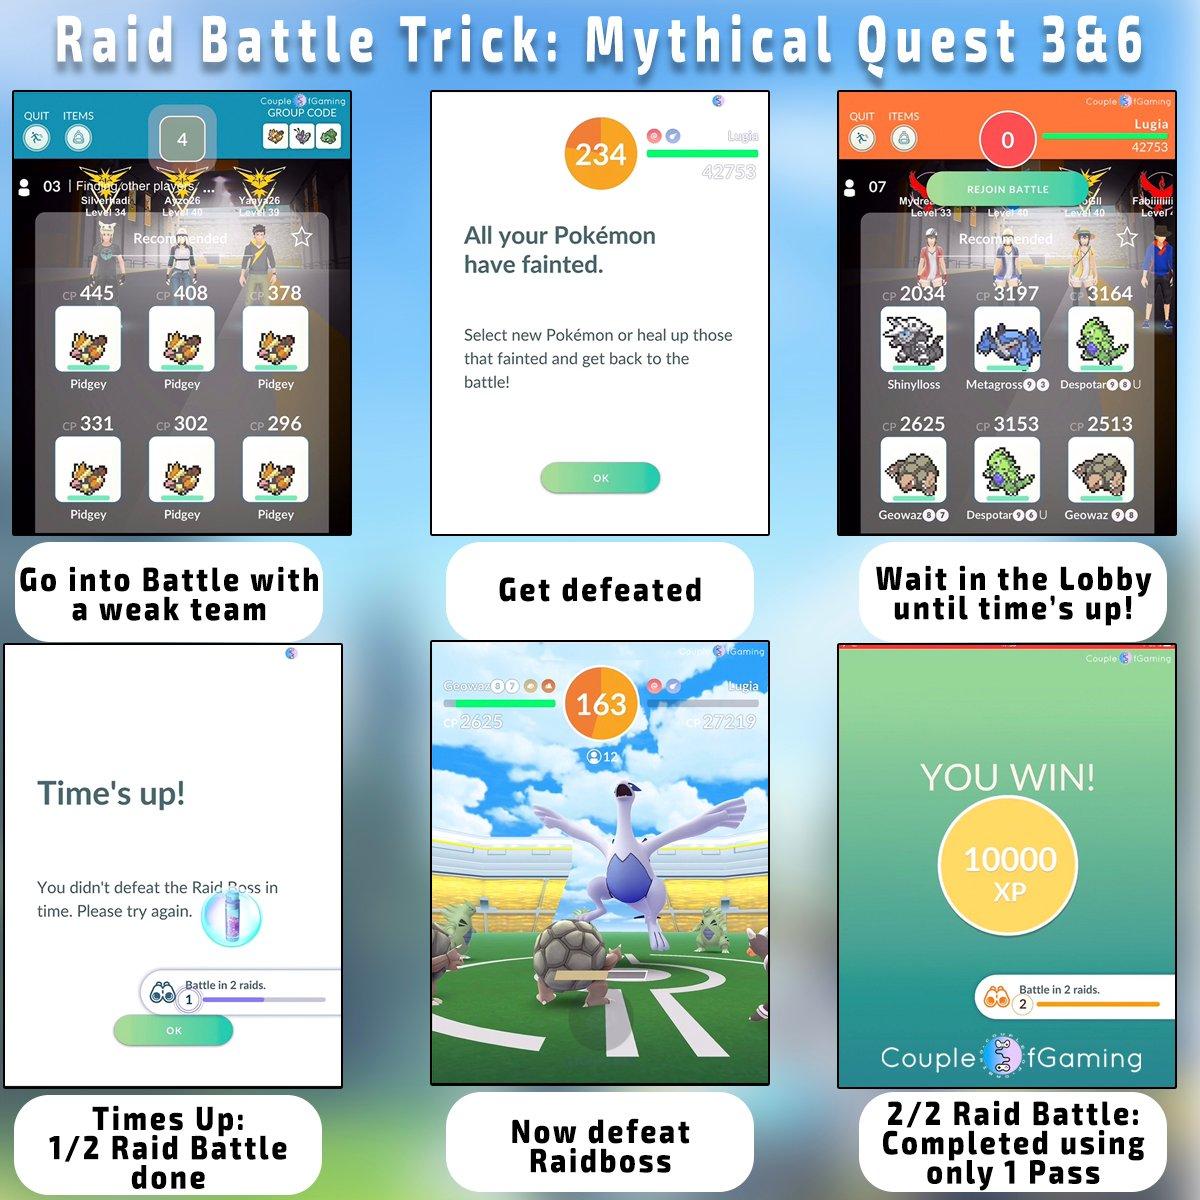 Raid Battle Trick